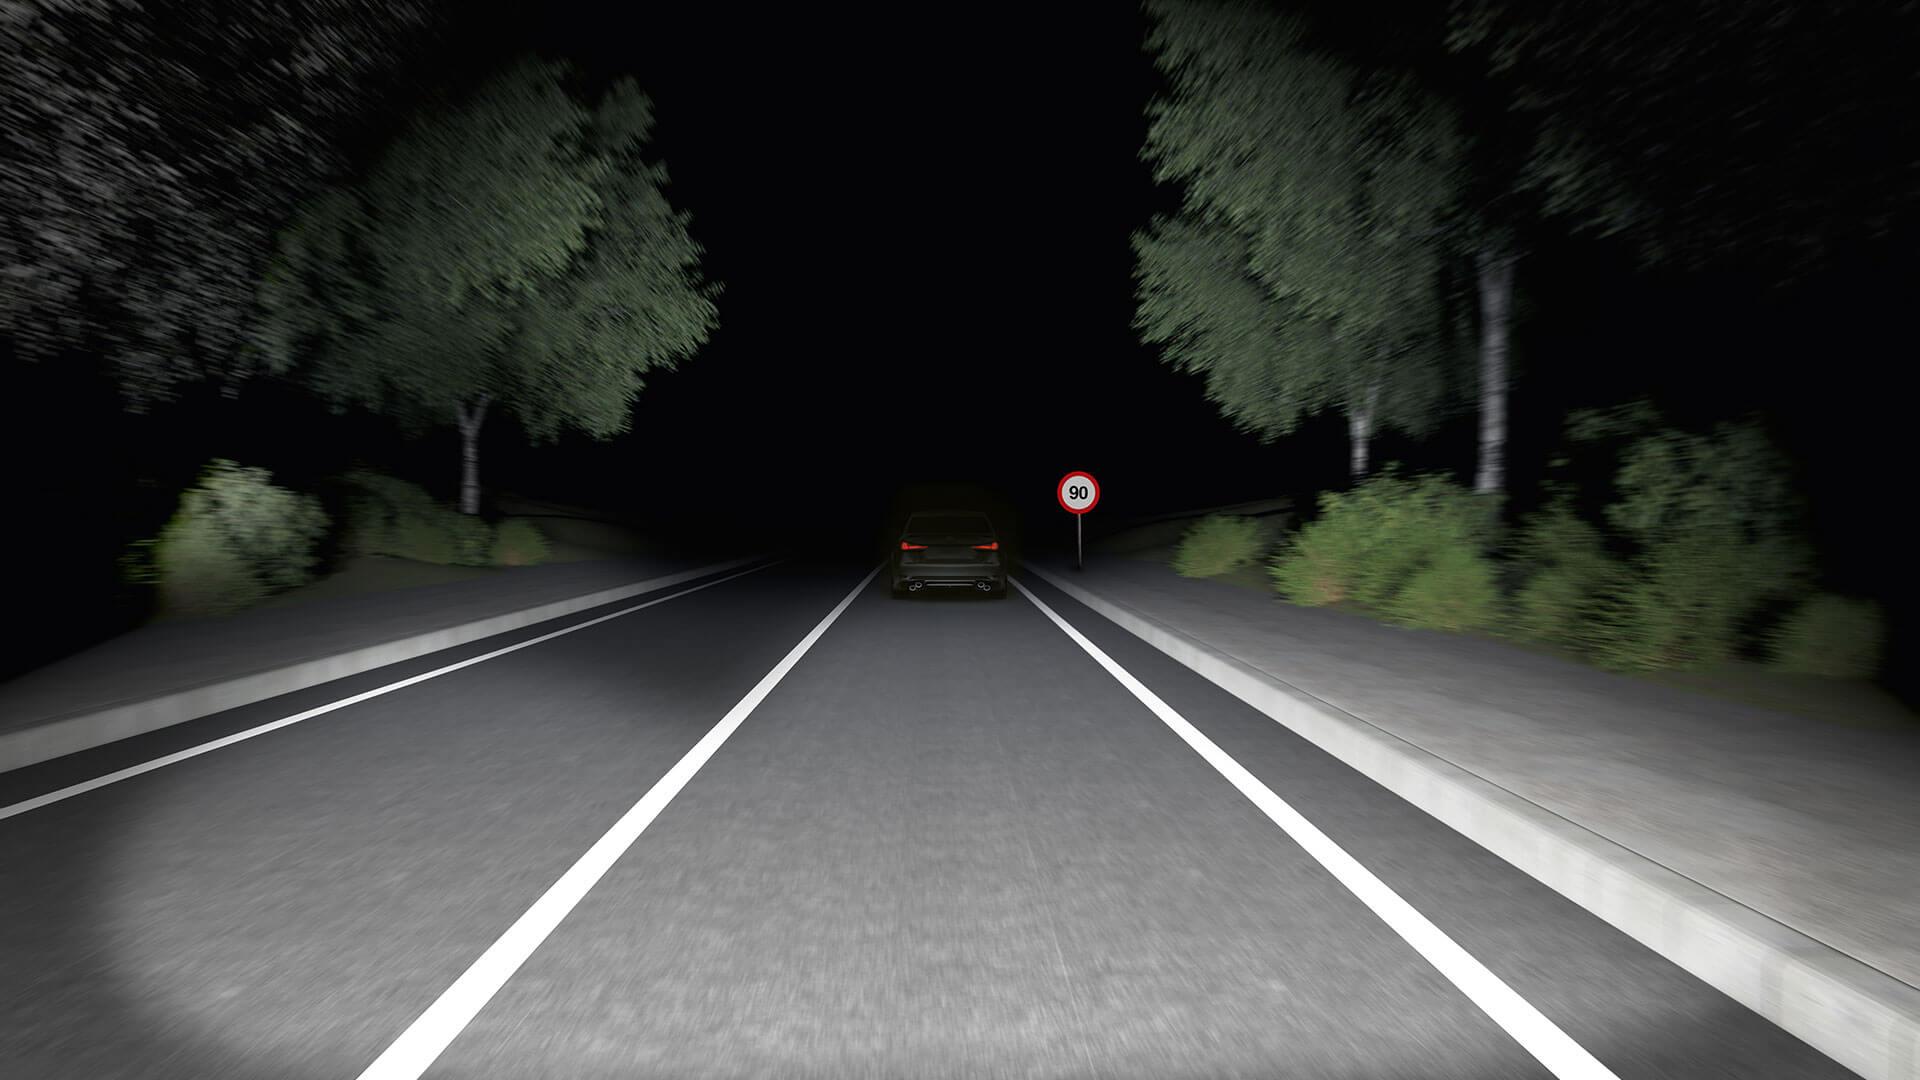 2017 lexus gs f features road sign assist